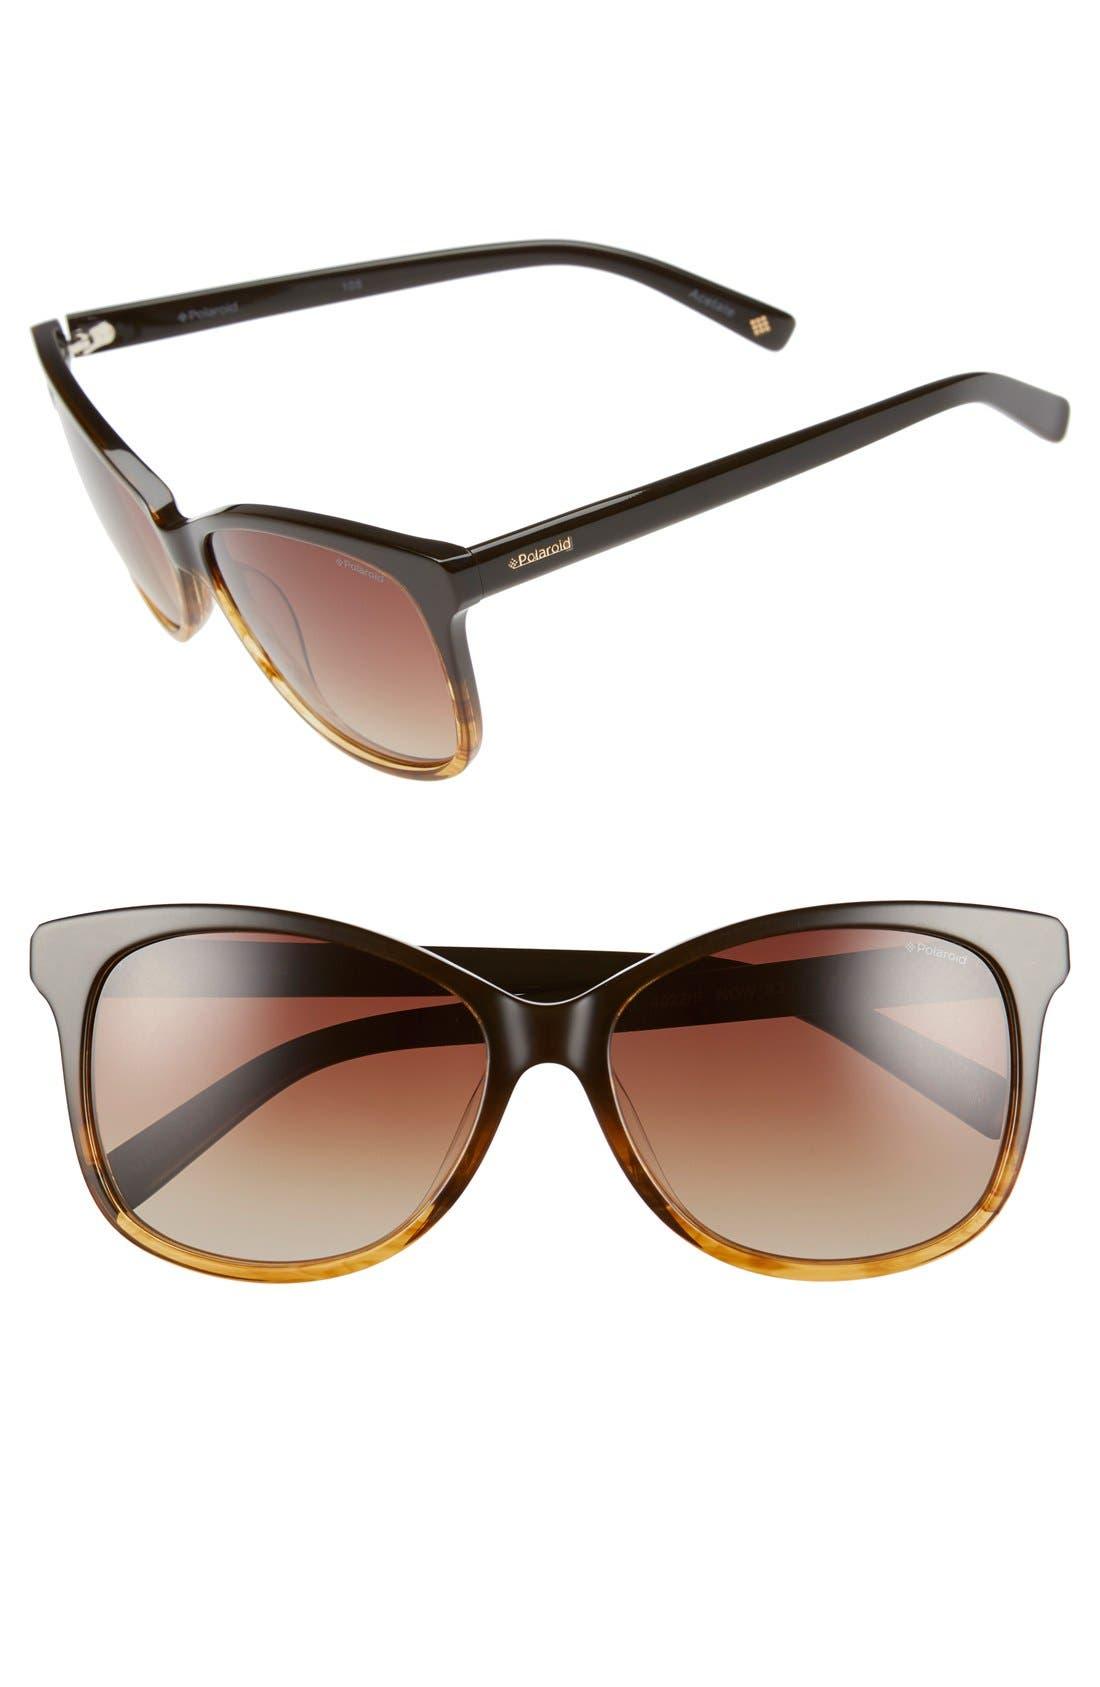 57mm Polarized Cat Eye Sunglasses,                         Main,                         color, Brown Honey/ Brown Polarized